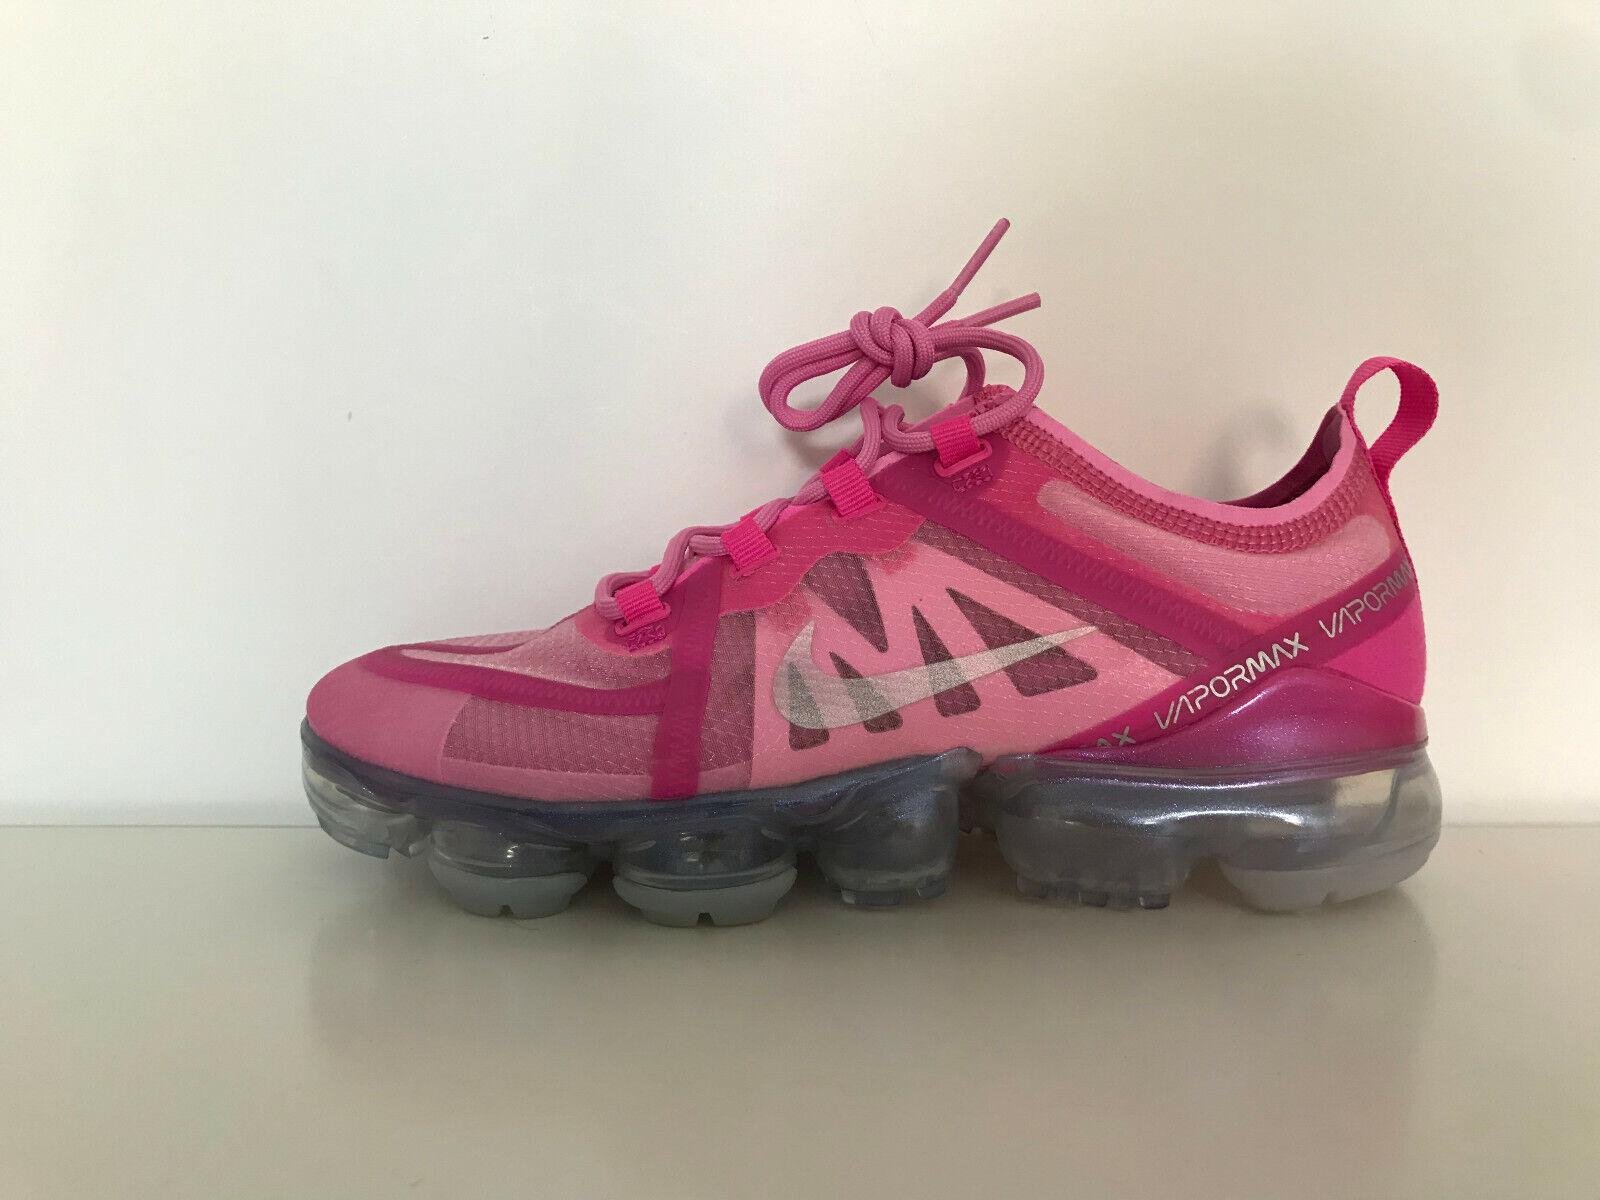 Nike Schuhe Damen Air Max Pink Vergleich Test +++ Nike